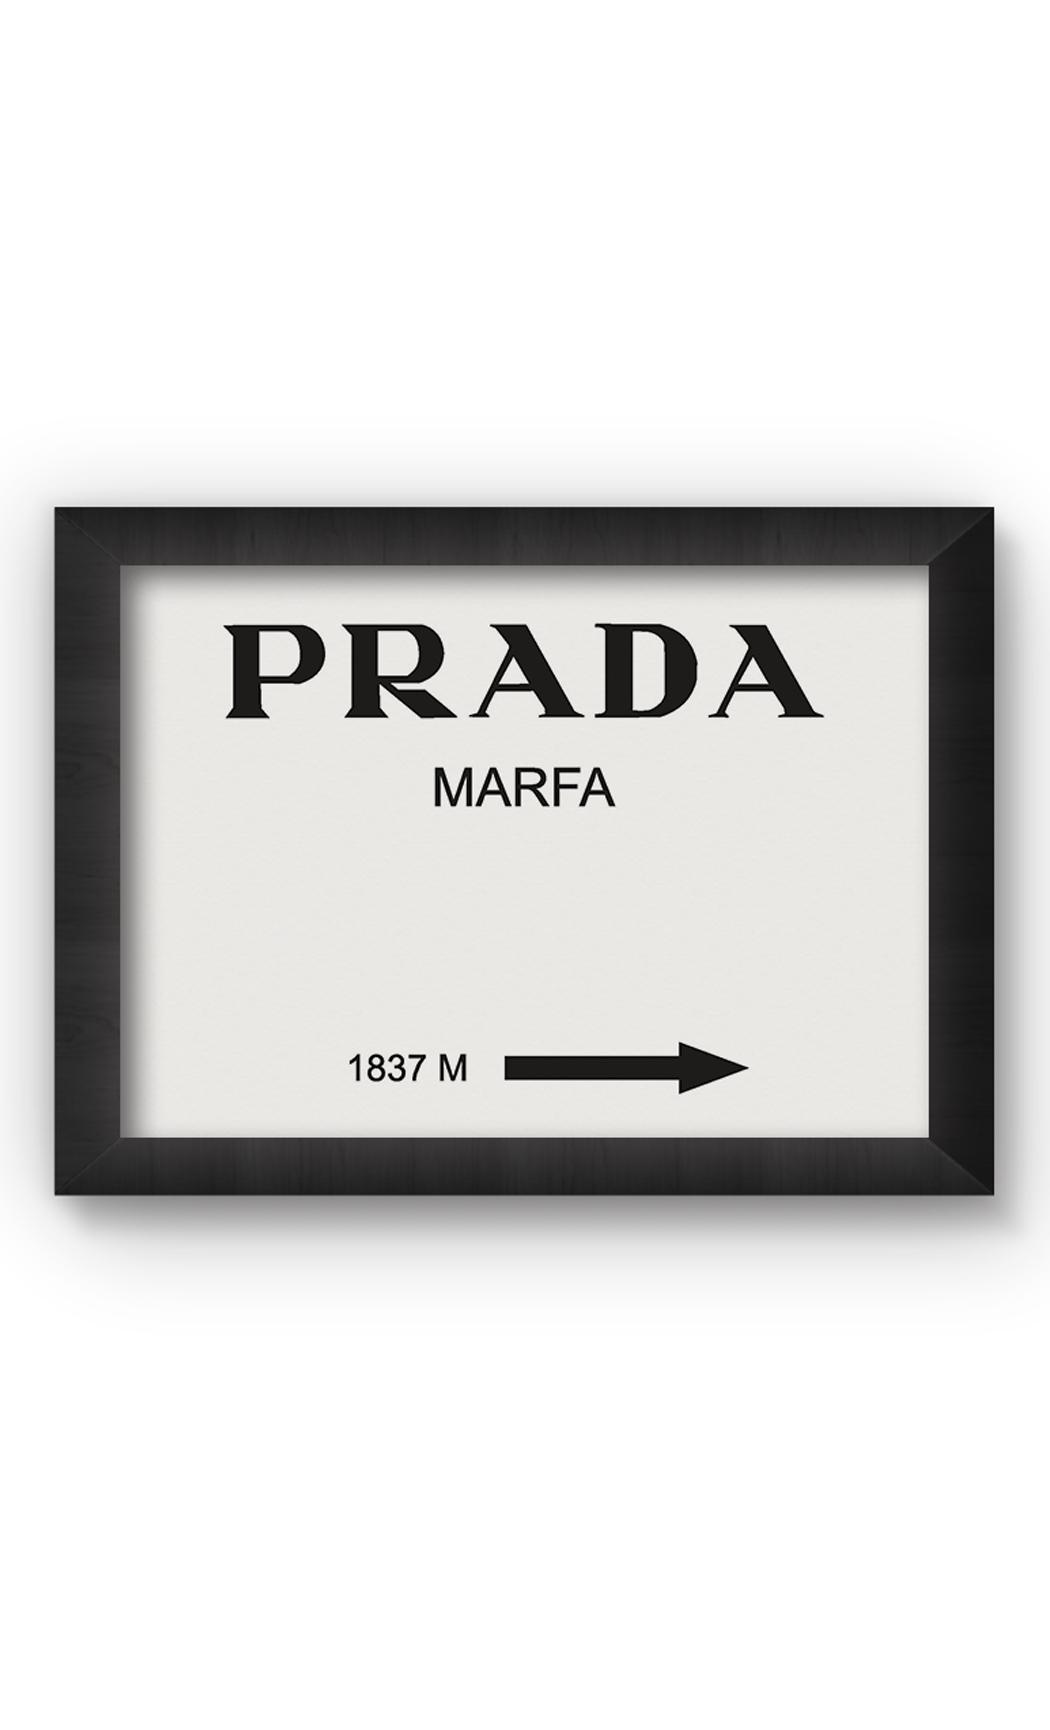 Black & White PRADA Poster. Buy Online.